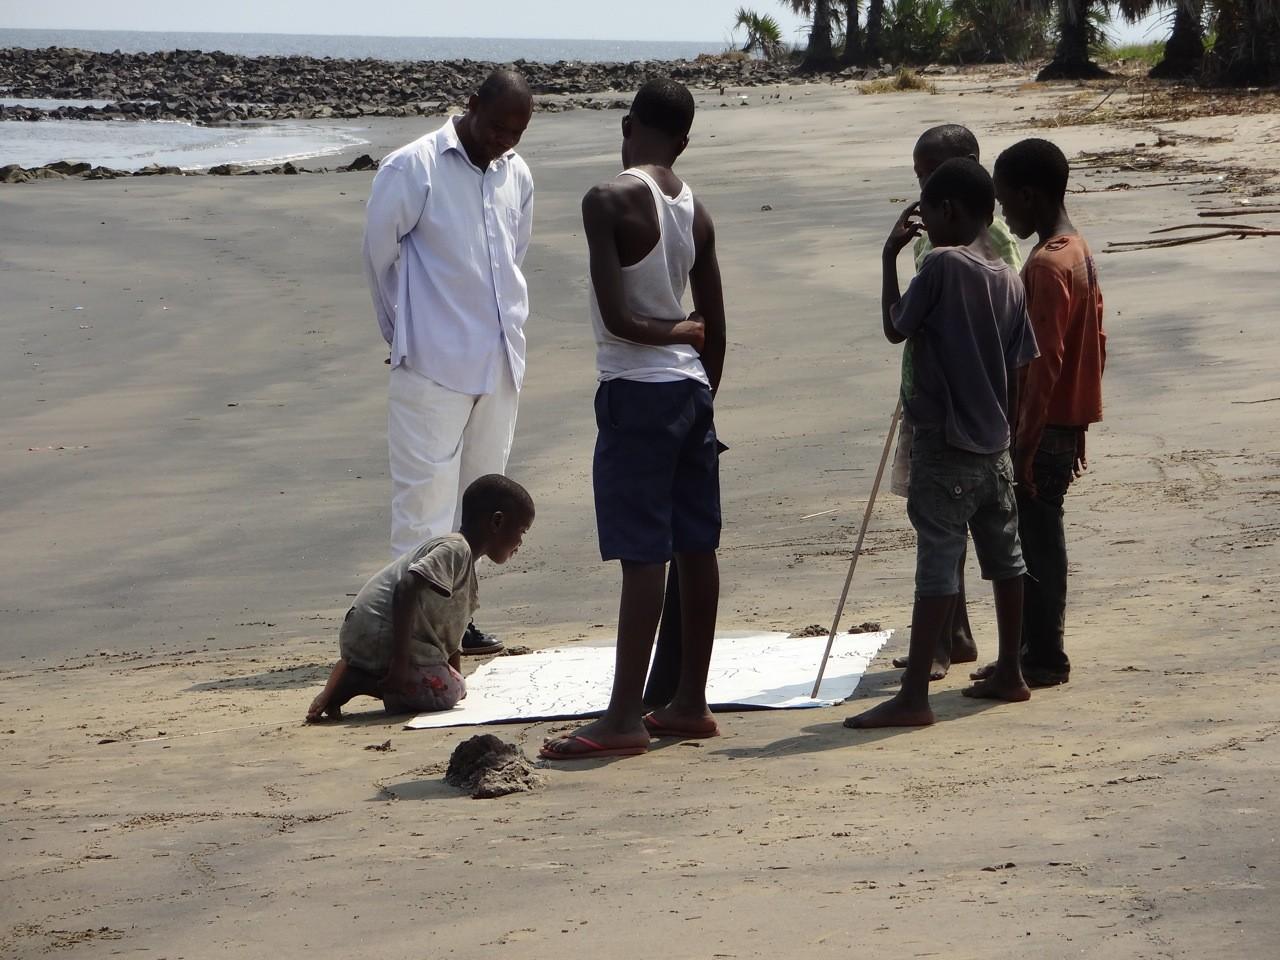 Wo der Kongo in den Atlantik fließt